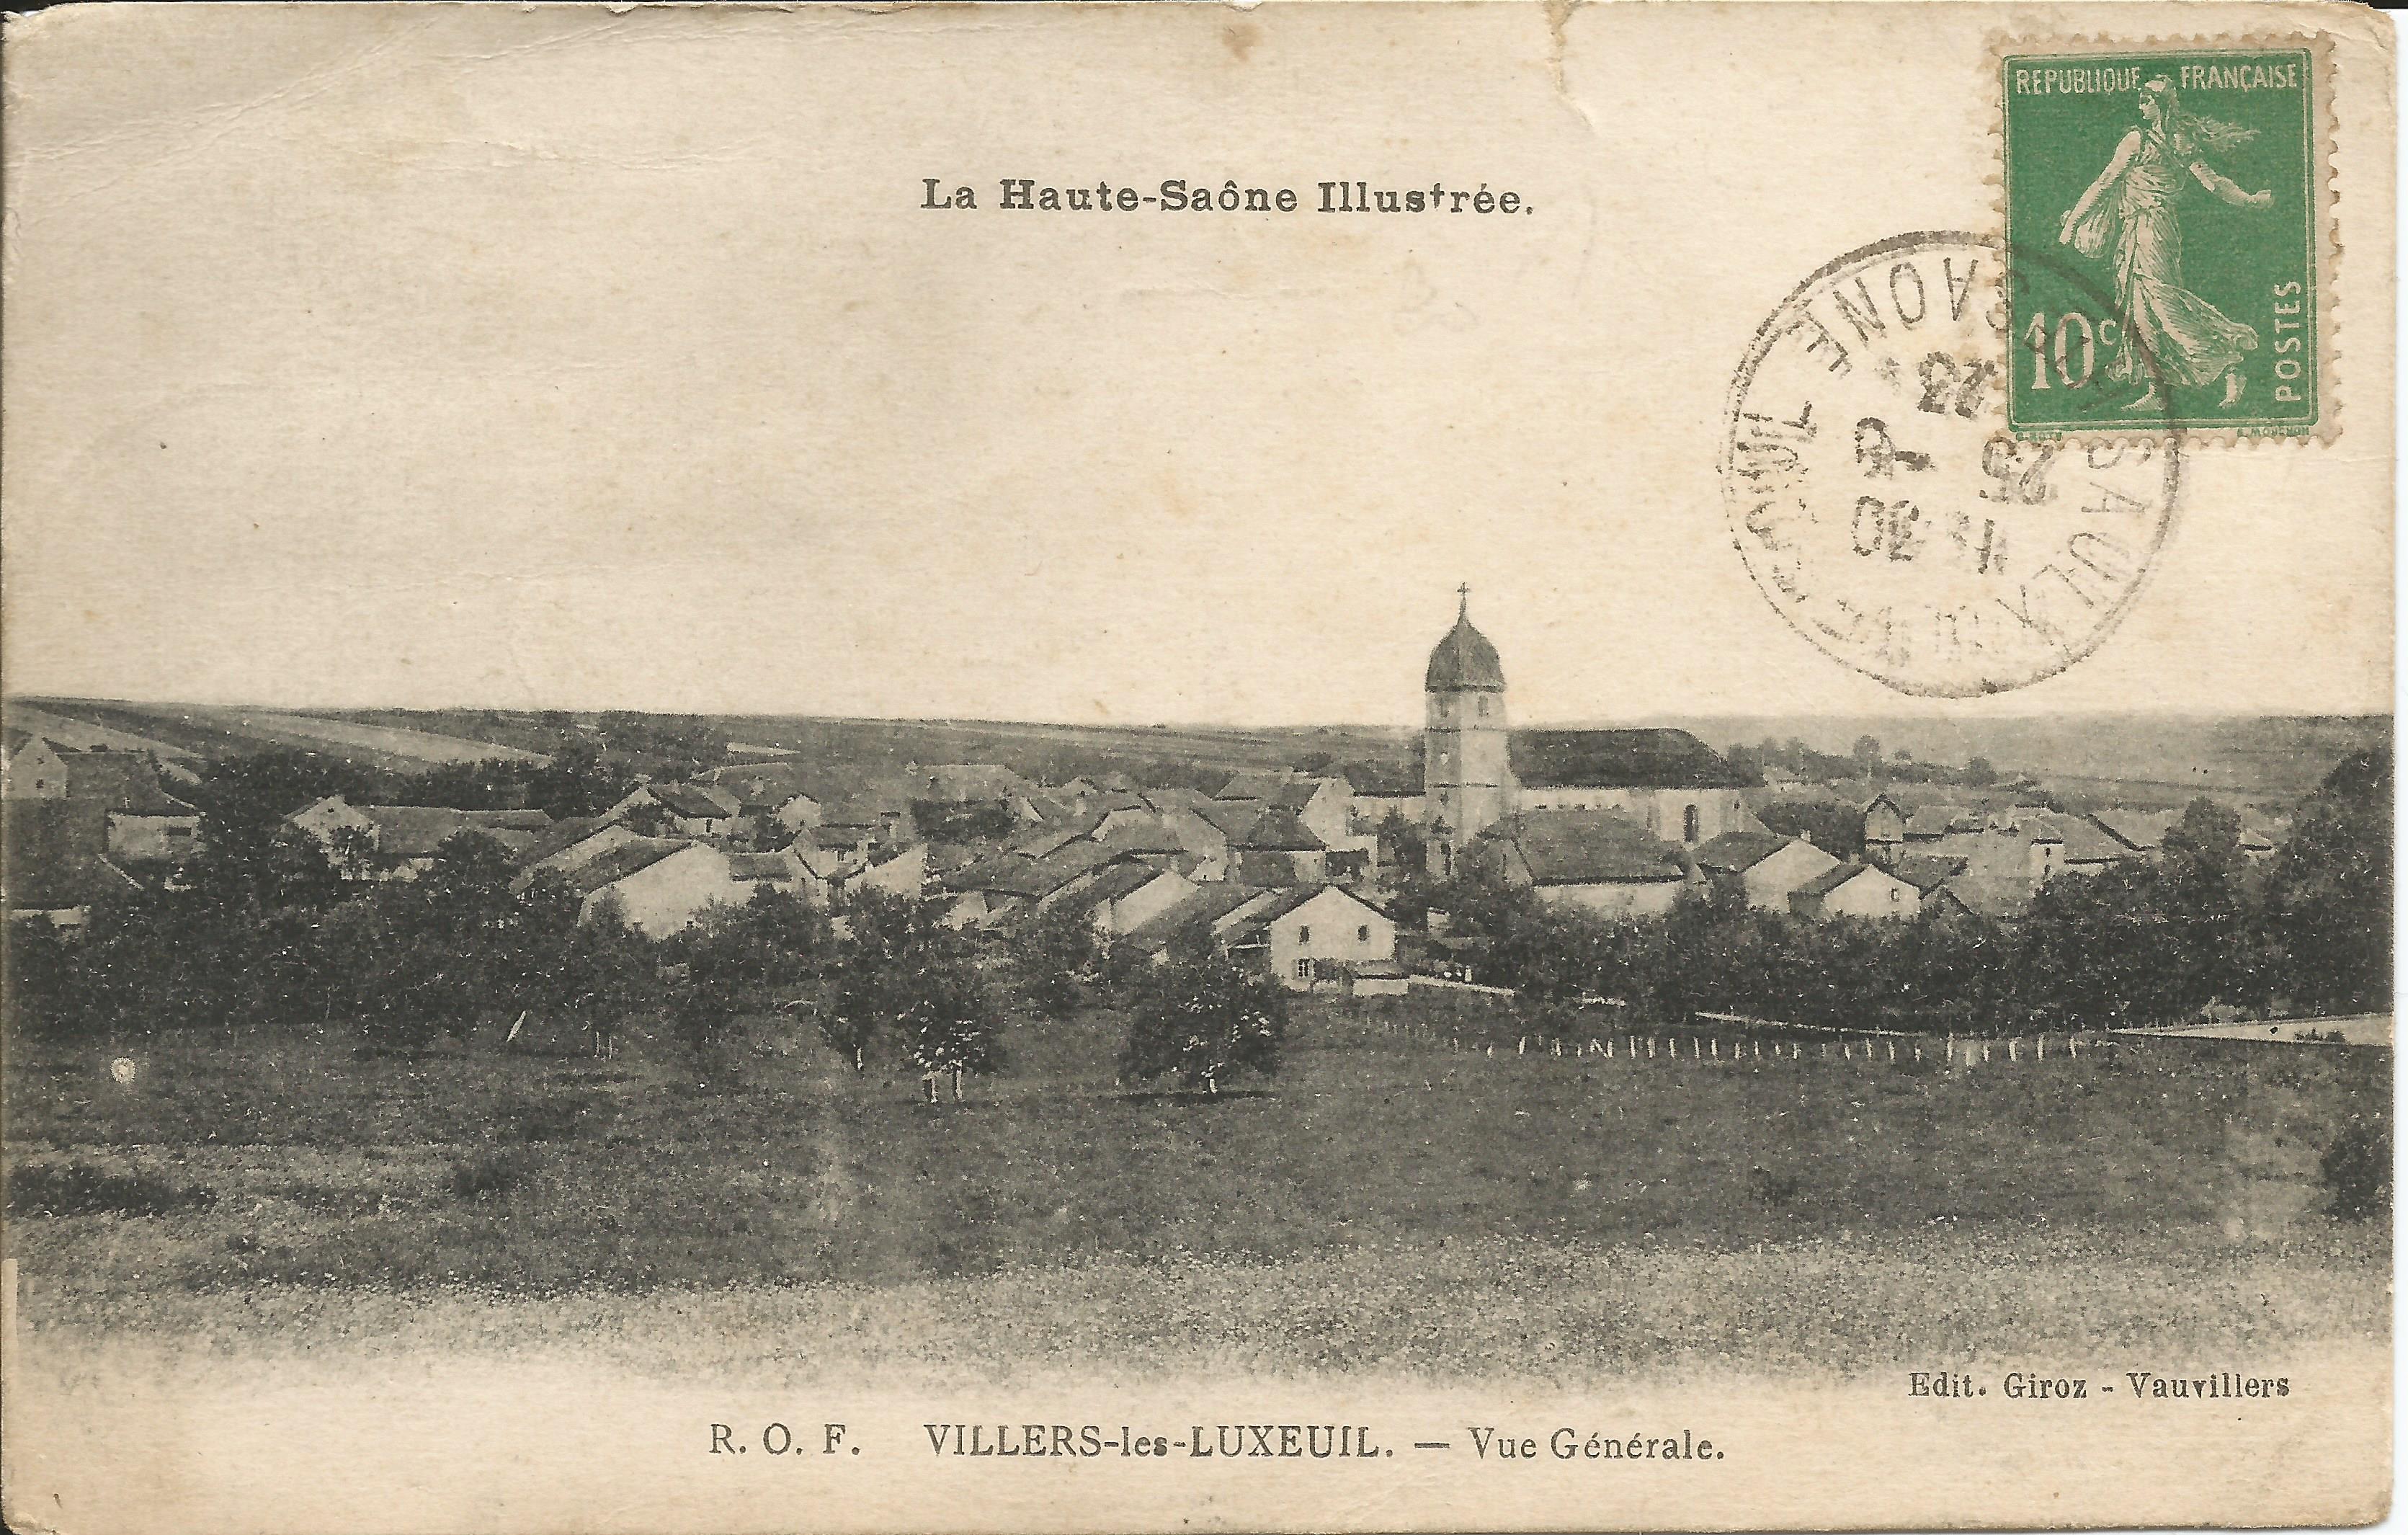 https://www.villers-les-luxeuil.com/projets/villers/files/images/Cartes_postales/General_2015/Vue_Generale_5.jpg